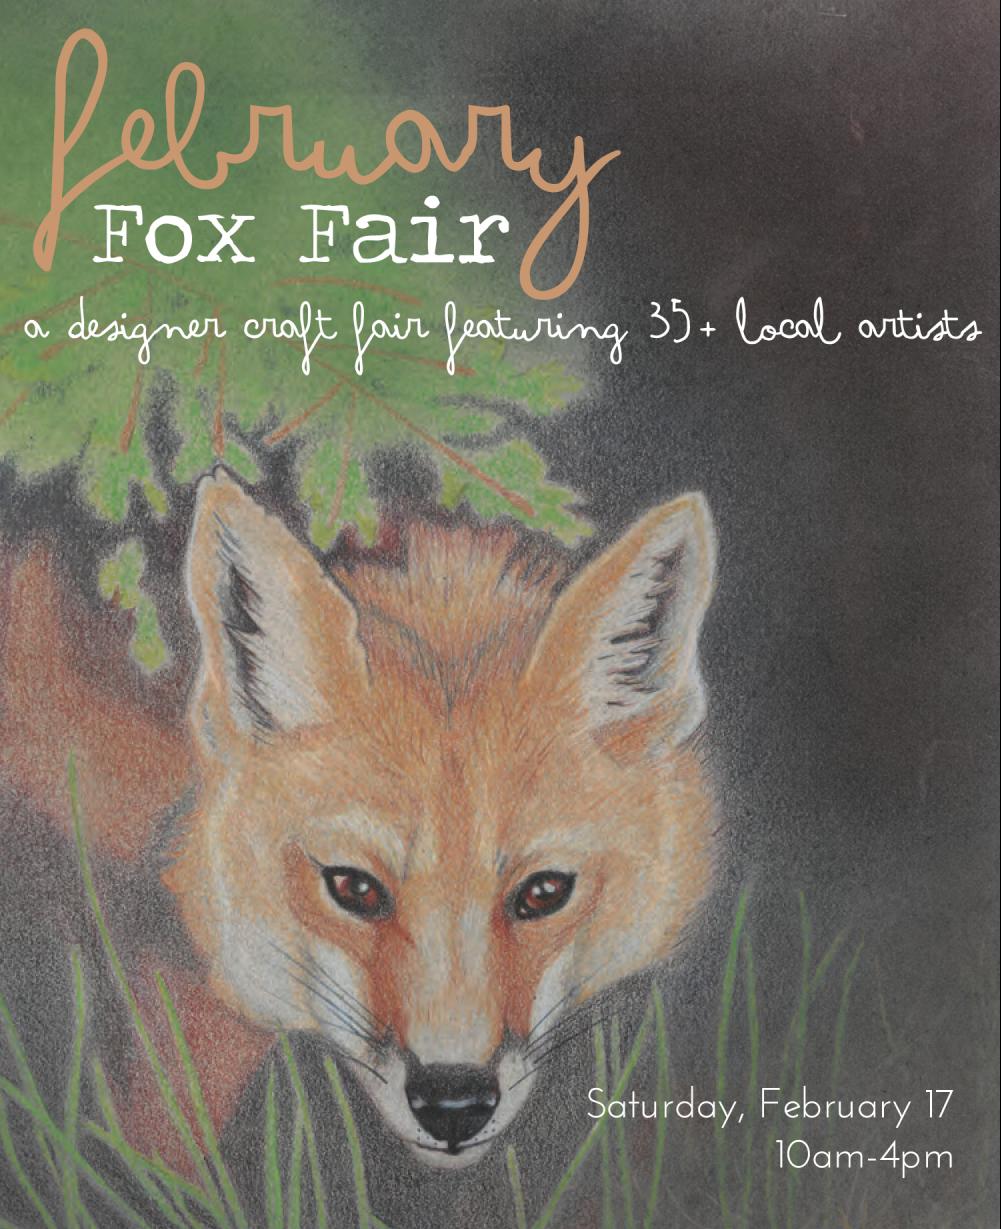 FebruaryFoxFair_Fernwood-NRG-Victoria-2018